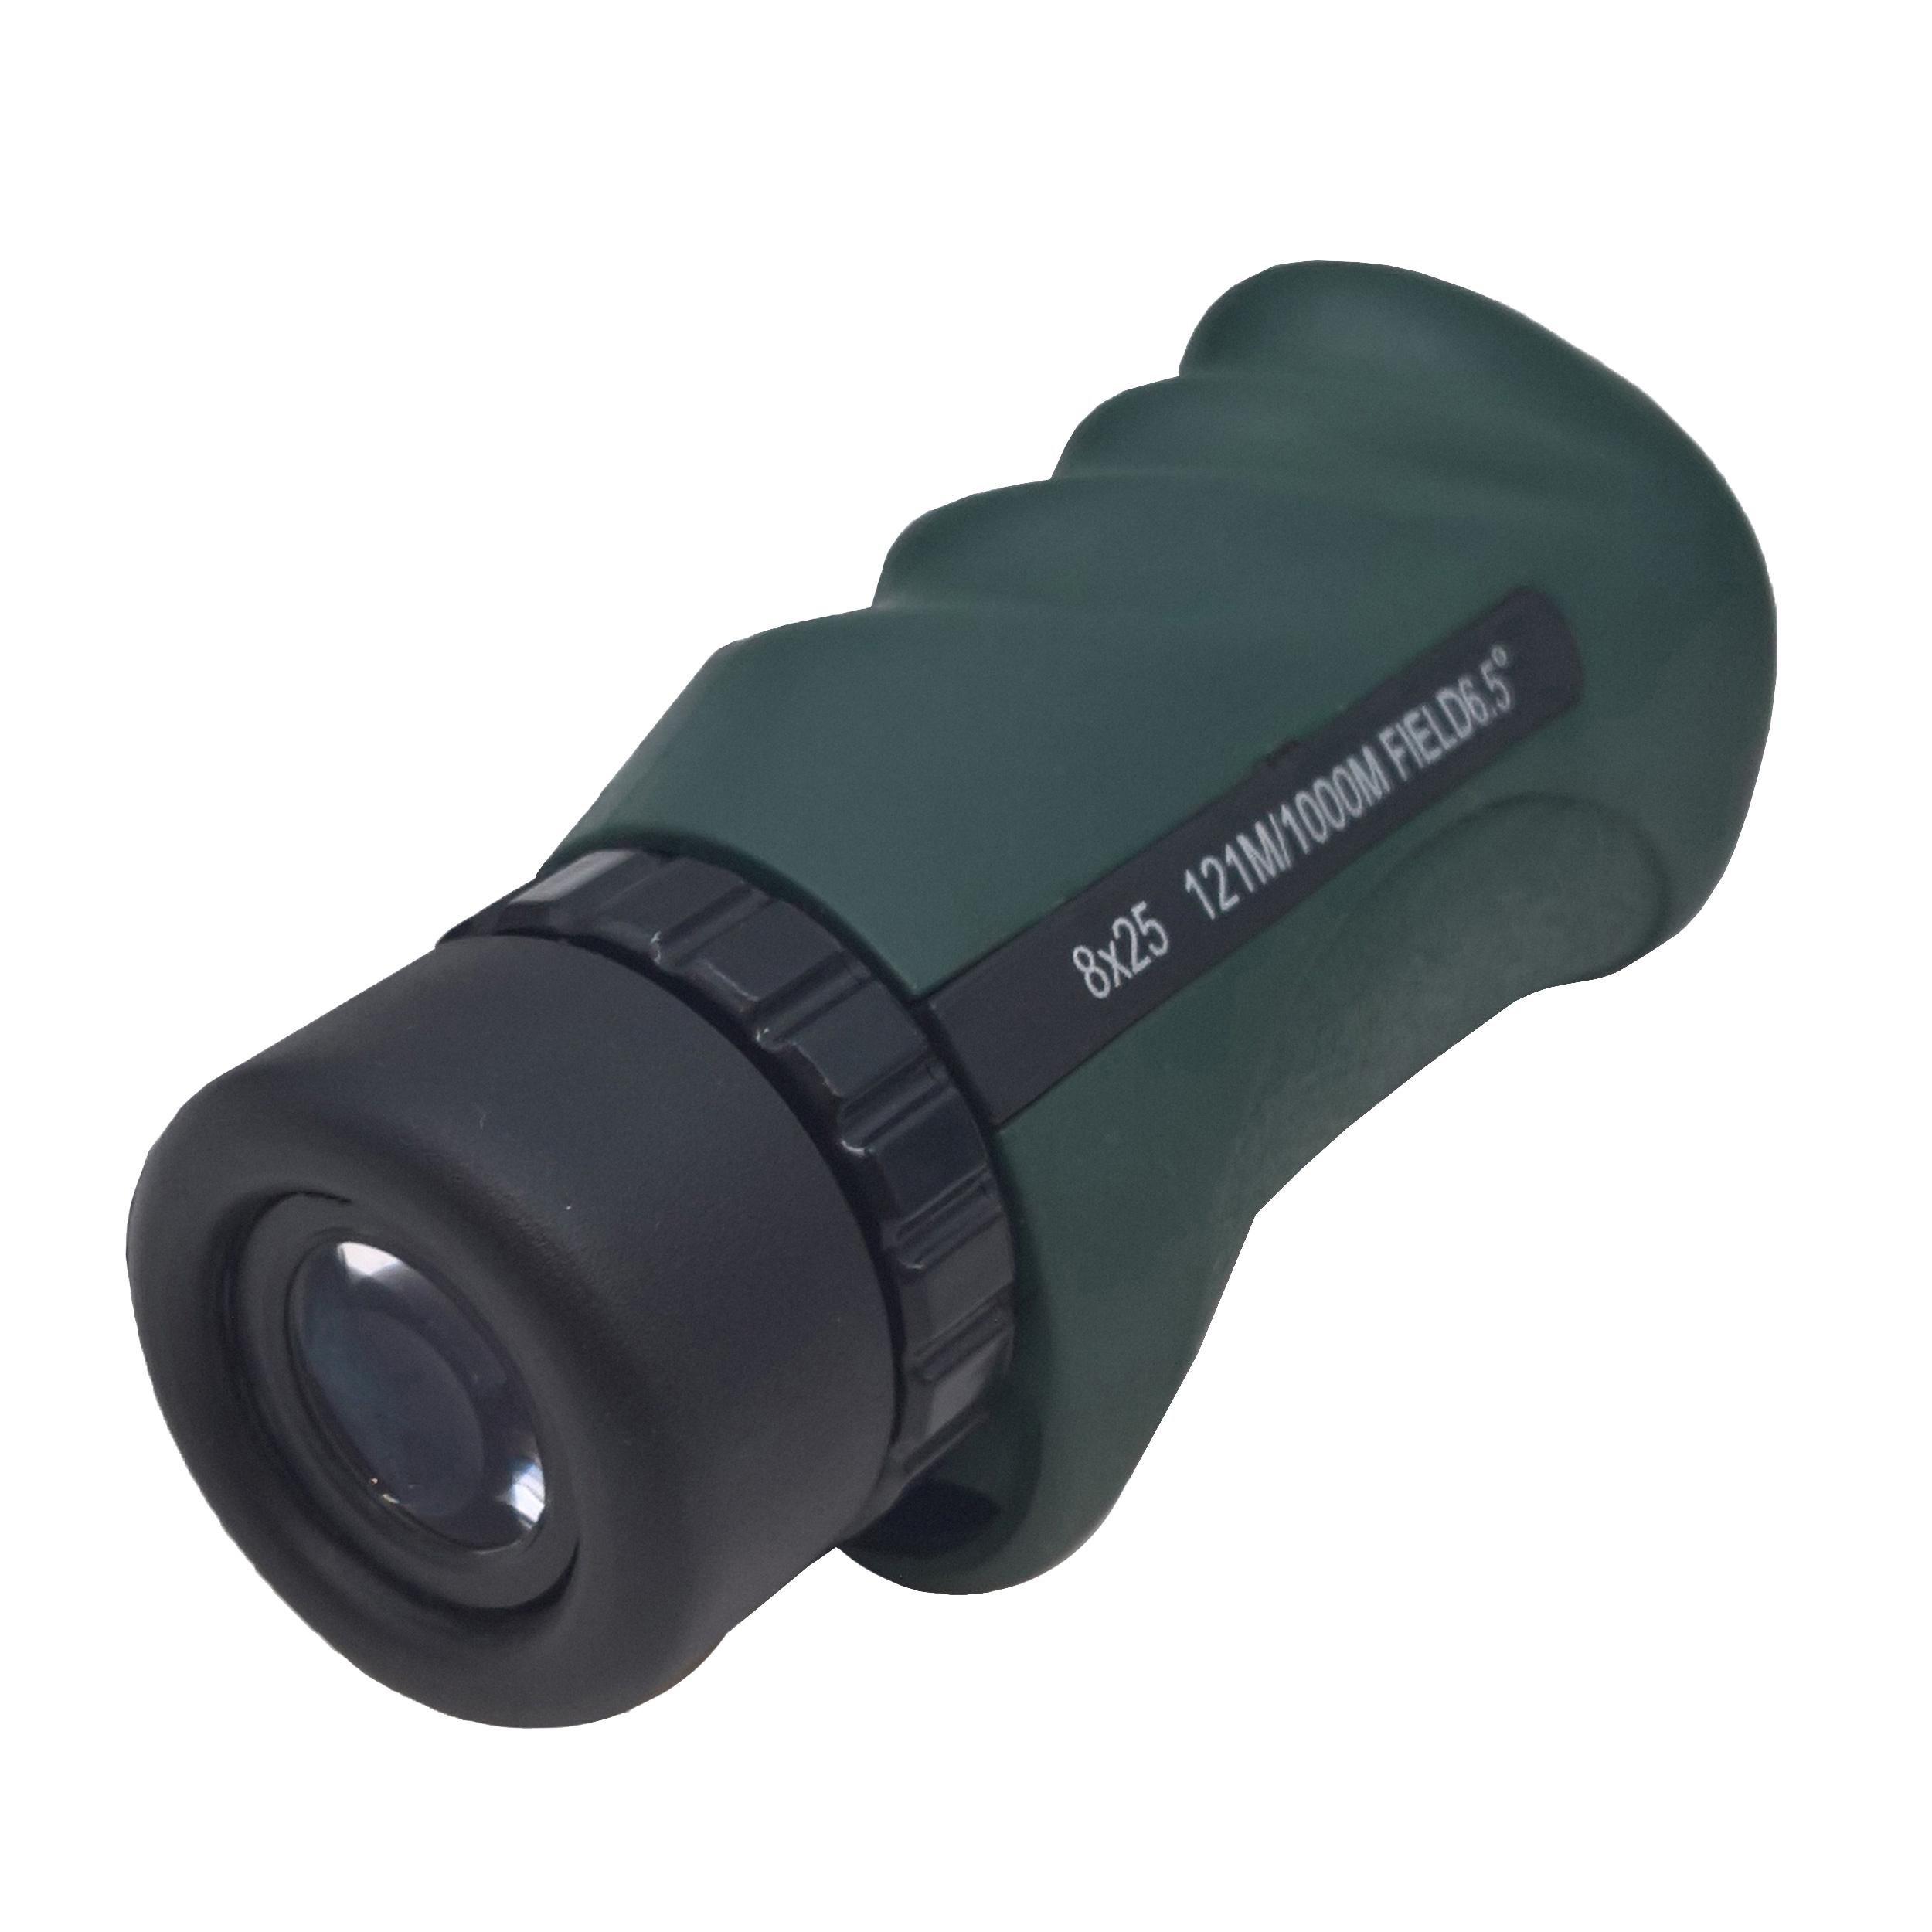 دوربین تک چشمی مدل 25×8 DHD